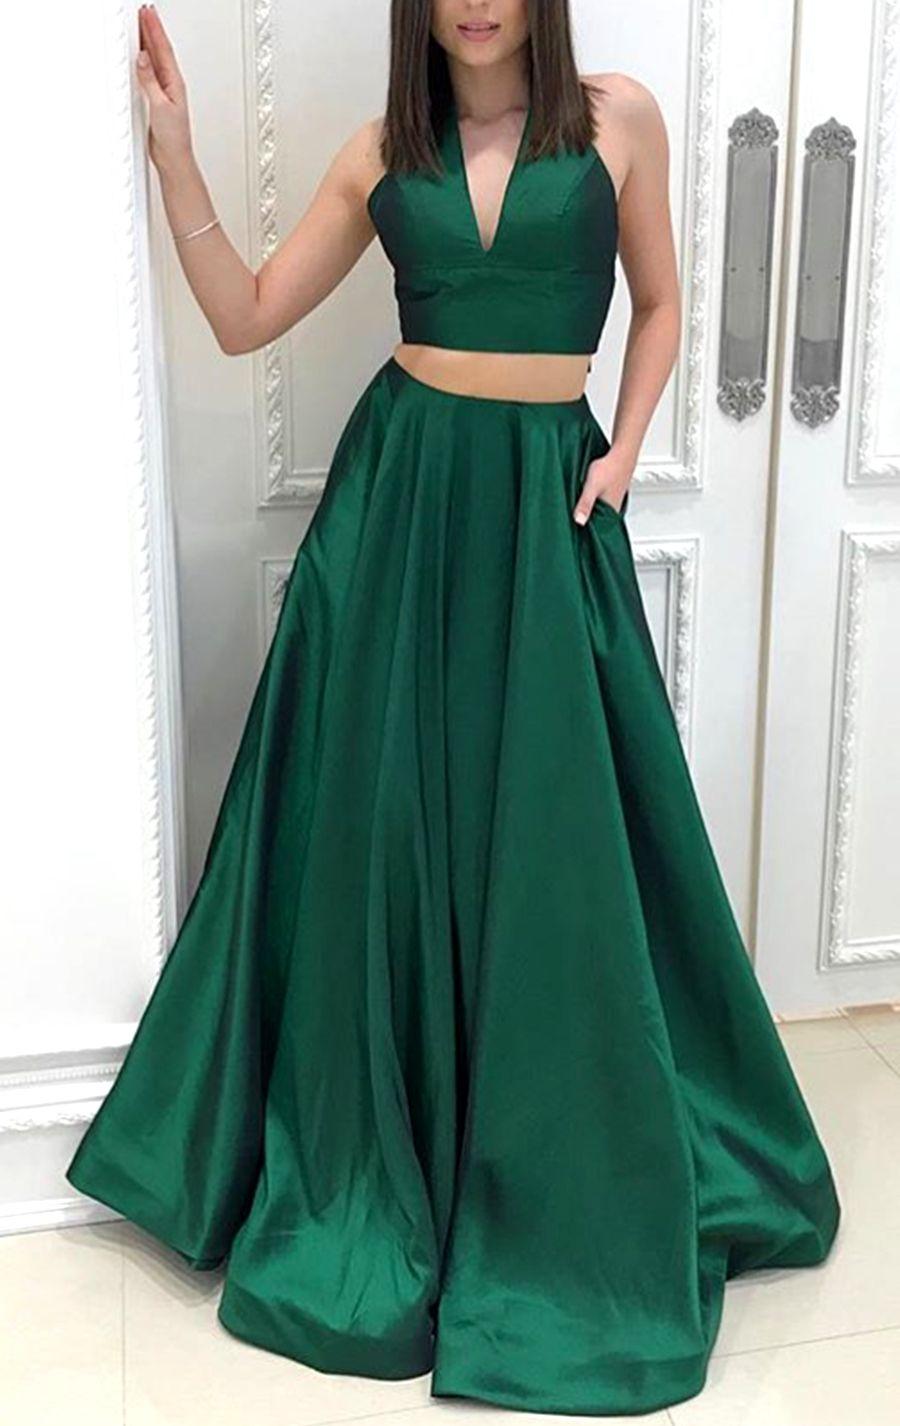 Gorgeous green prom dress  Halter V Neck  Piece Taffeta Prom Dress Green Formal Evening Gown